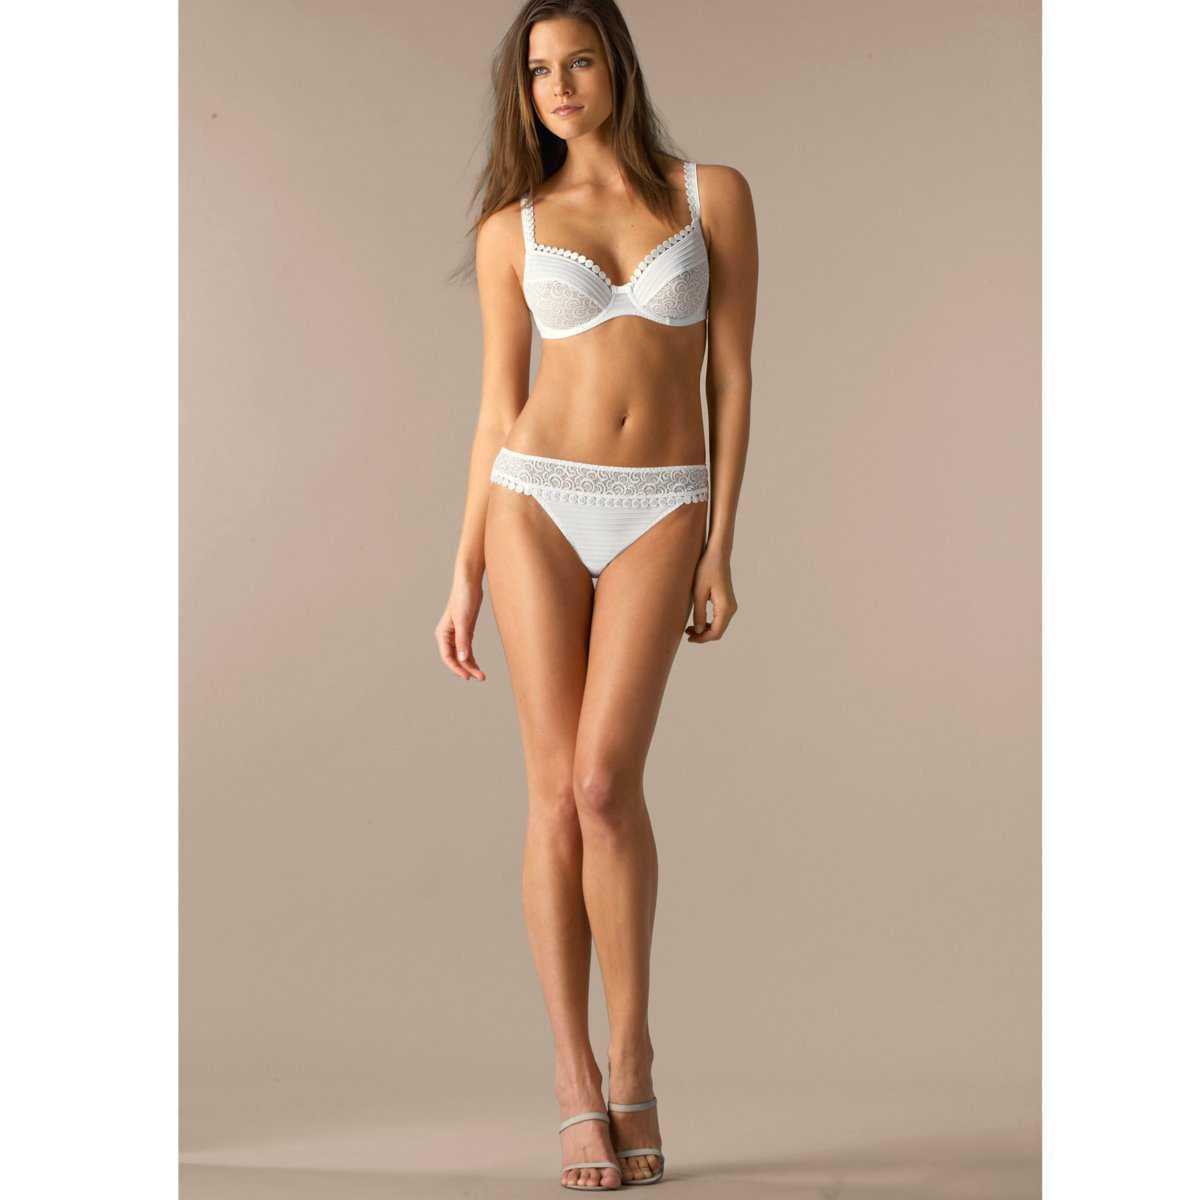 Kim Cloutier sexy white bikini pic